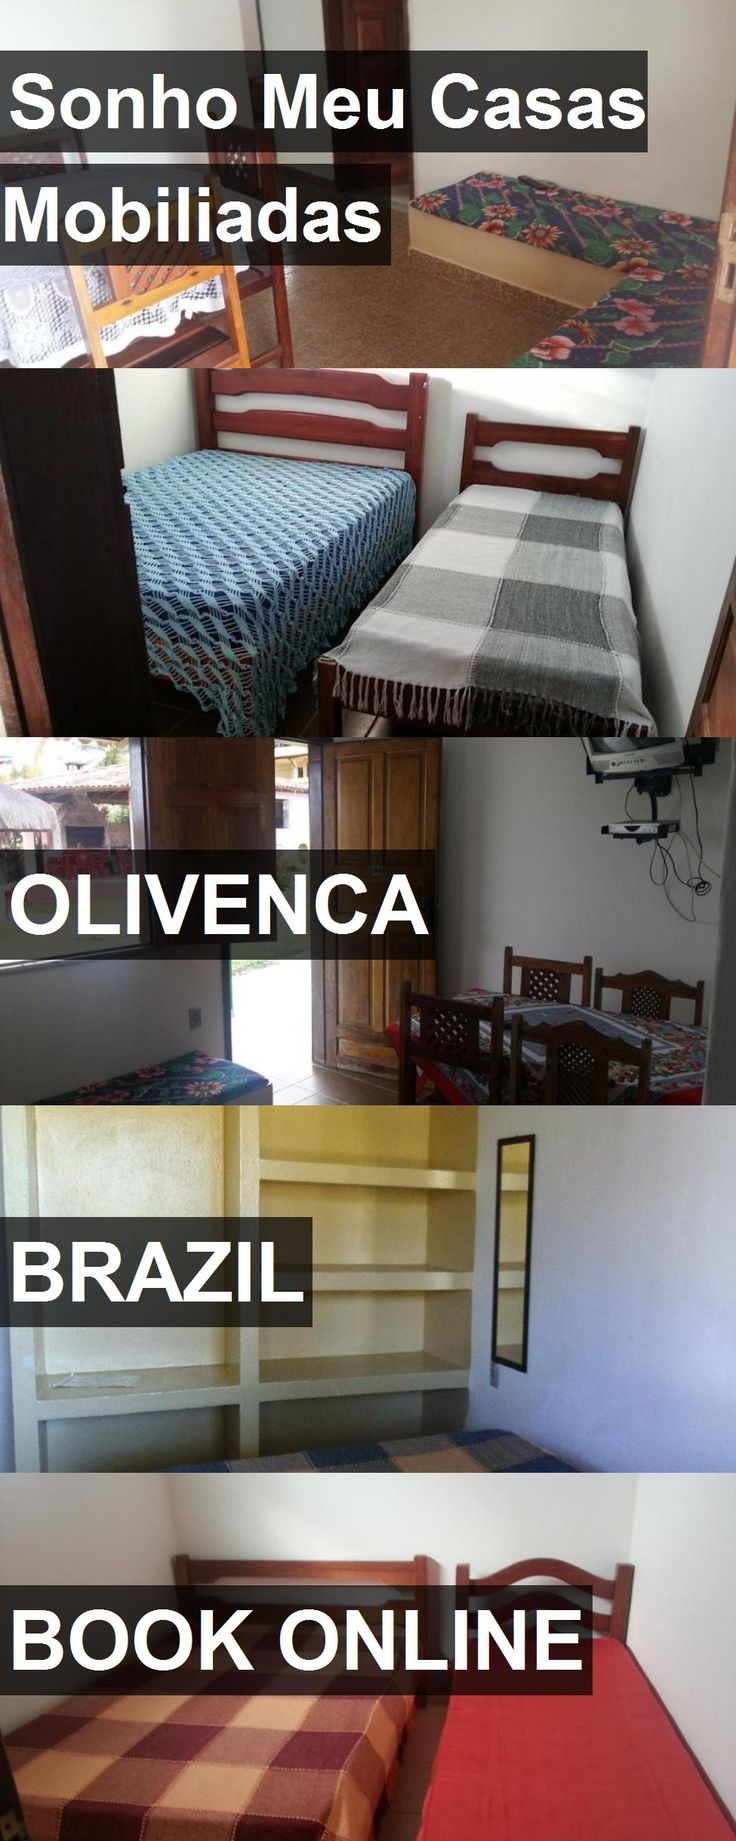 Hotel Sonho Meu Casas Mobiliadas in Olivenca, Brazil. For more information, photos, reviews and best prices please follow the link. #Brazil #Olivenca #SonhoMeuCasasMobiliadas #hotel #travel #vacation